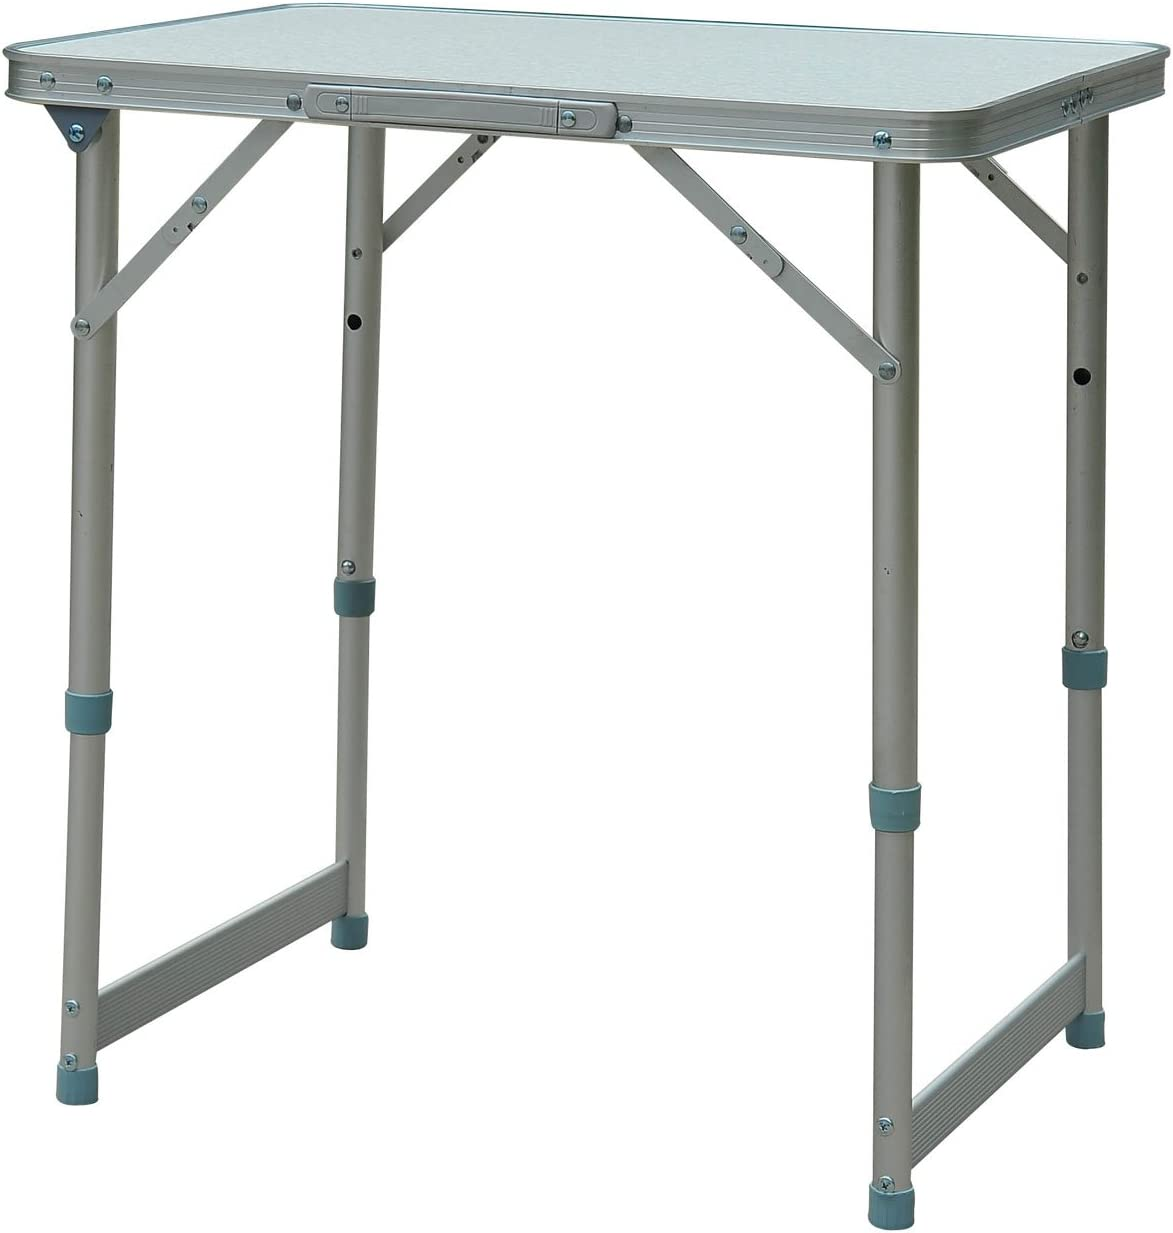 Outsunny Mesa Plegable de Picnic como una Maleta para Playa Camping 60x45x65cm Aluminio Altura Ajustable